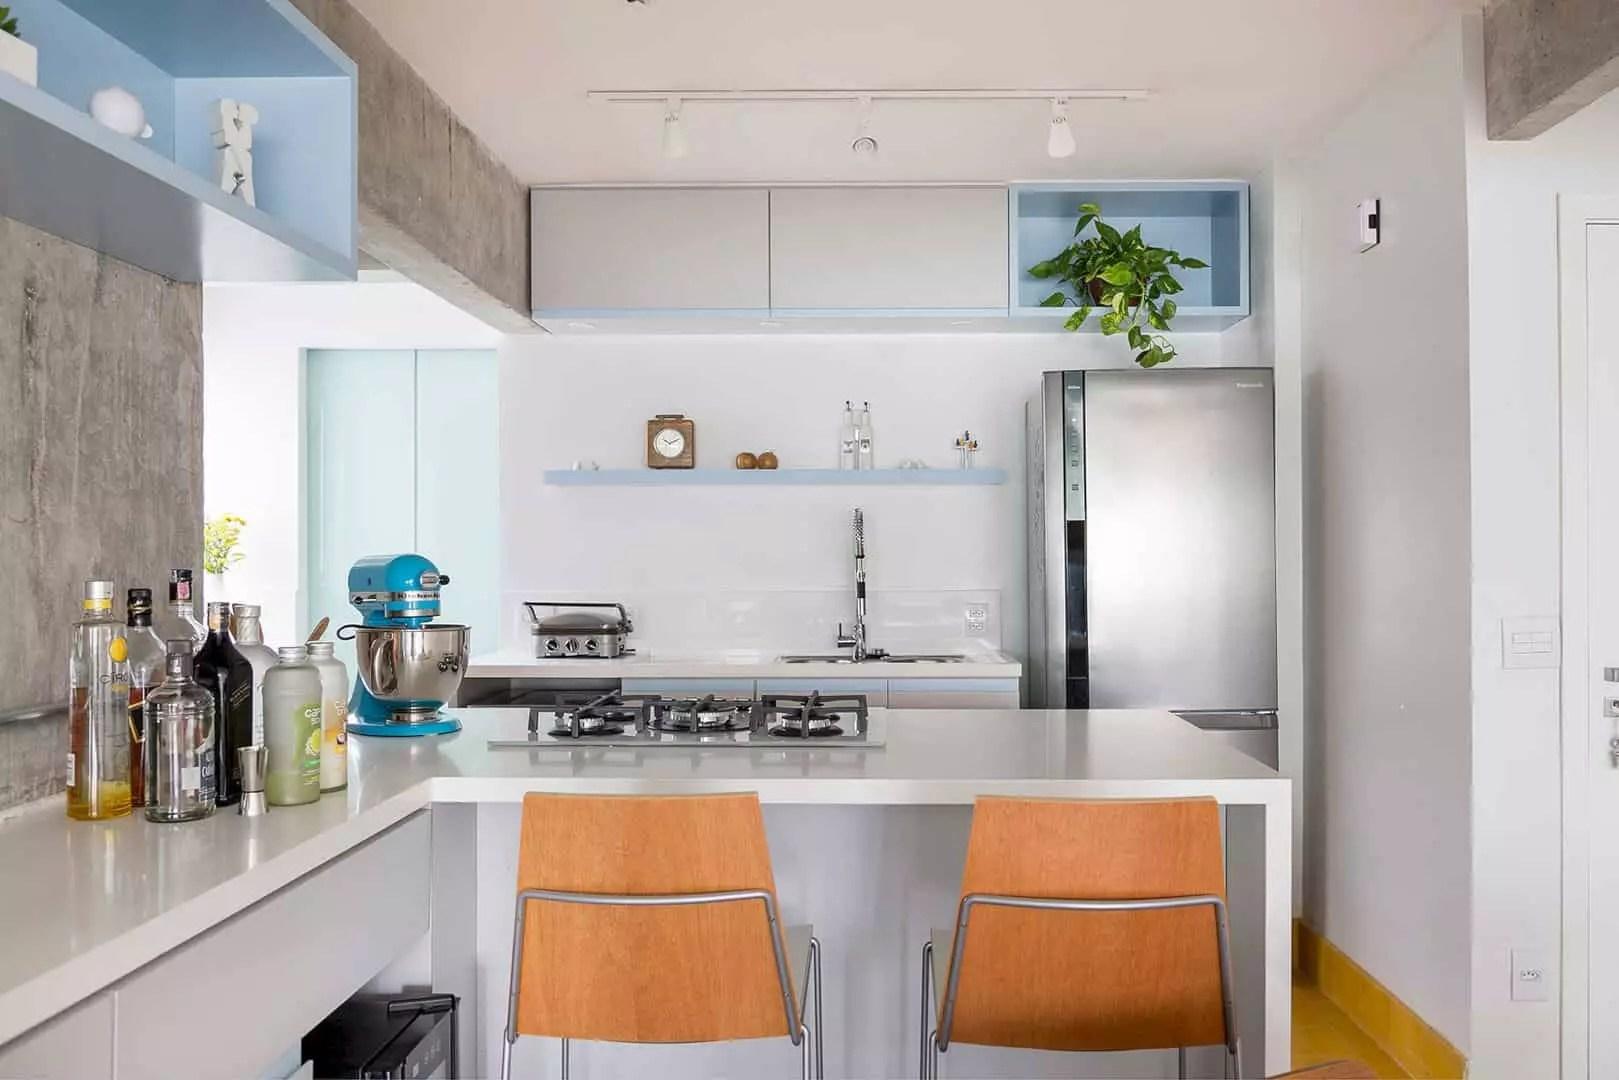 Apartamento Joaquim Antunes: Elegant Apartment with Concrete Wall and Colorful Accent